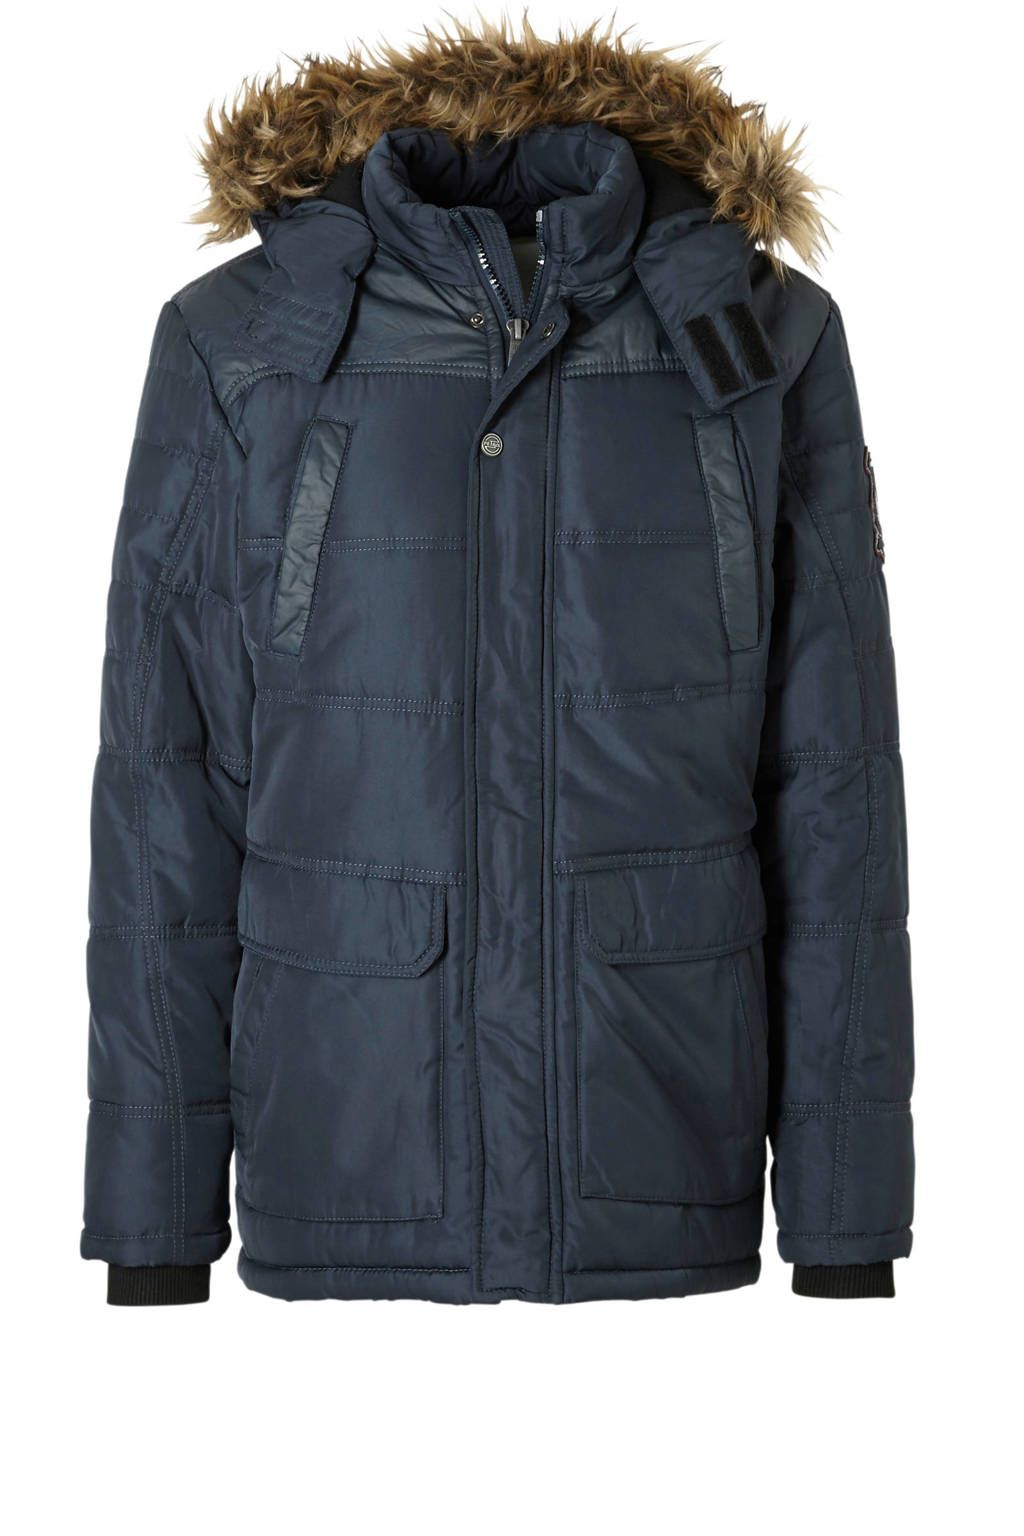 Petrol Industries jas donkerblauw, Donkerblauw